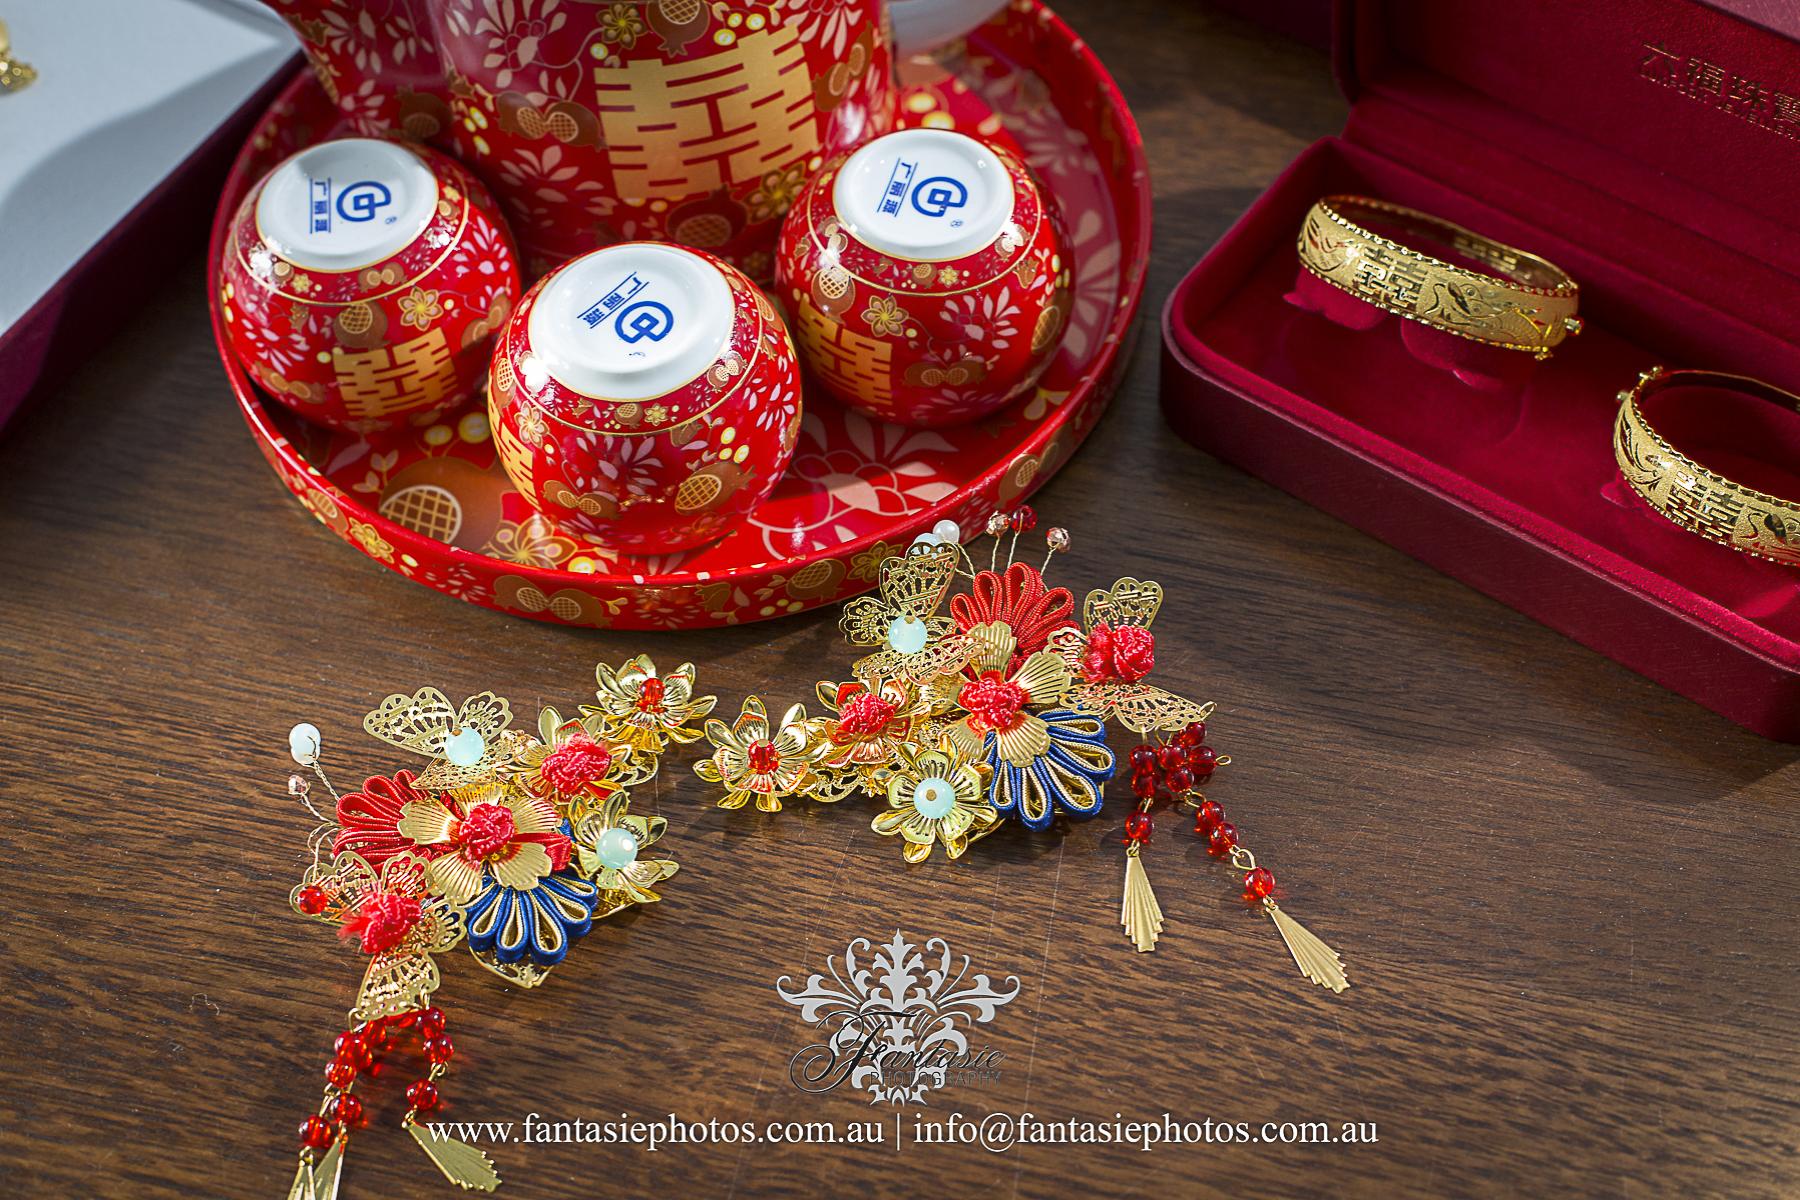 Chinese Asian Wedding Photography | Fantasie Photography